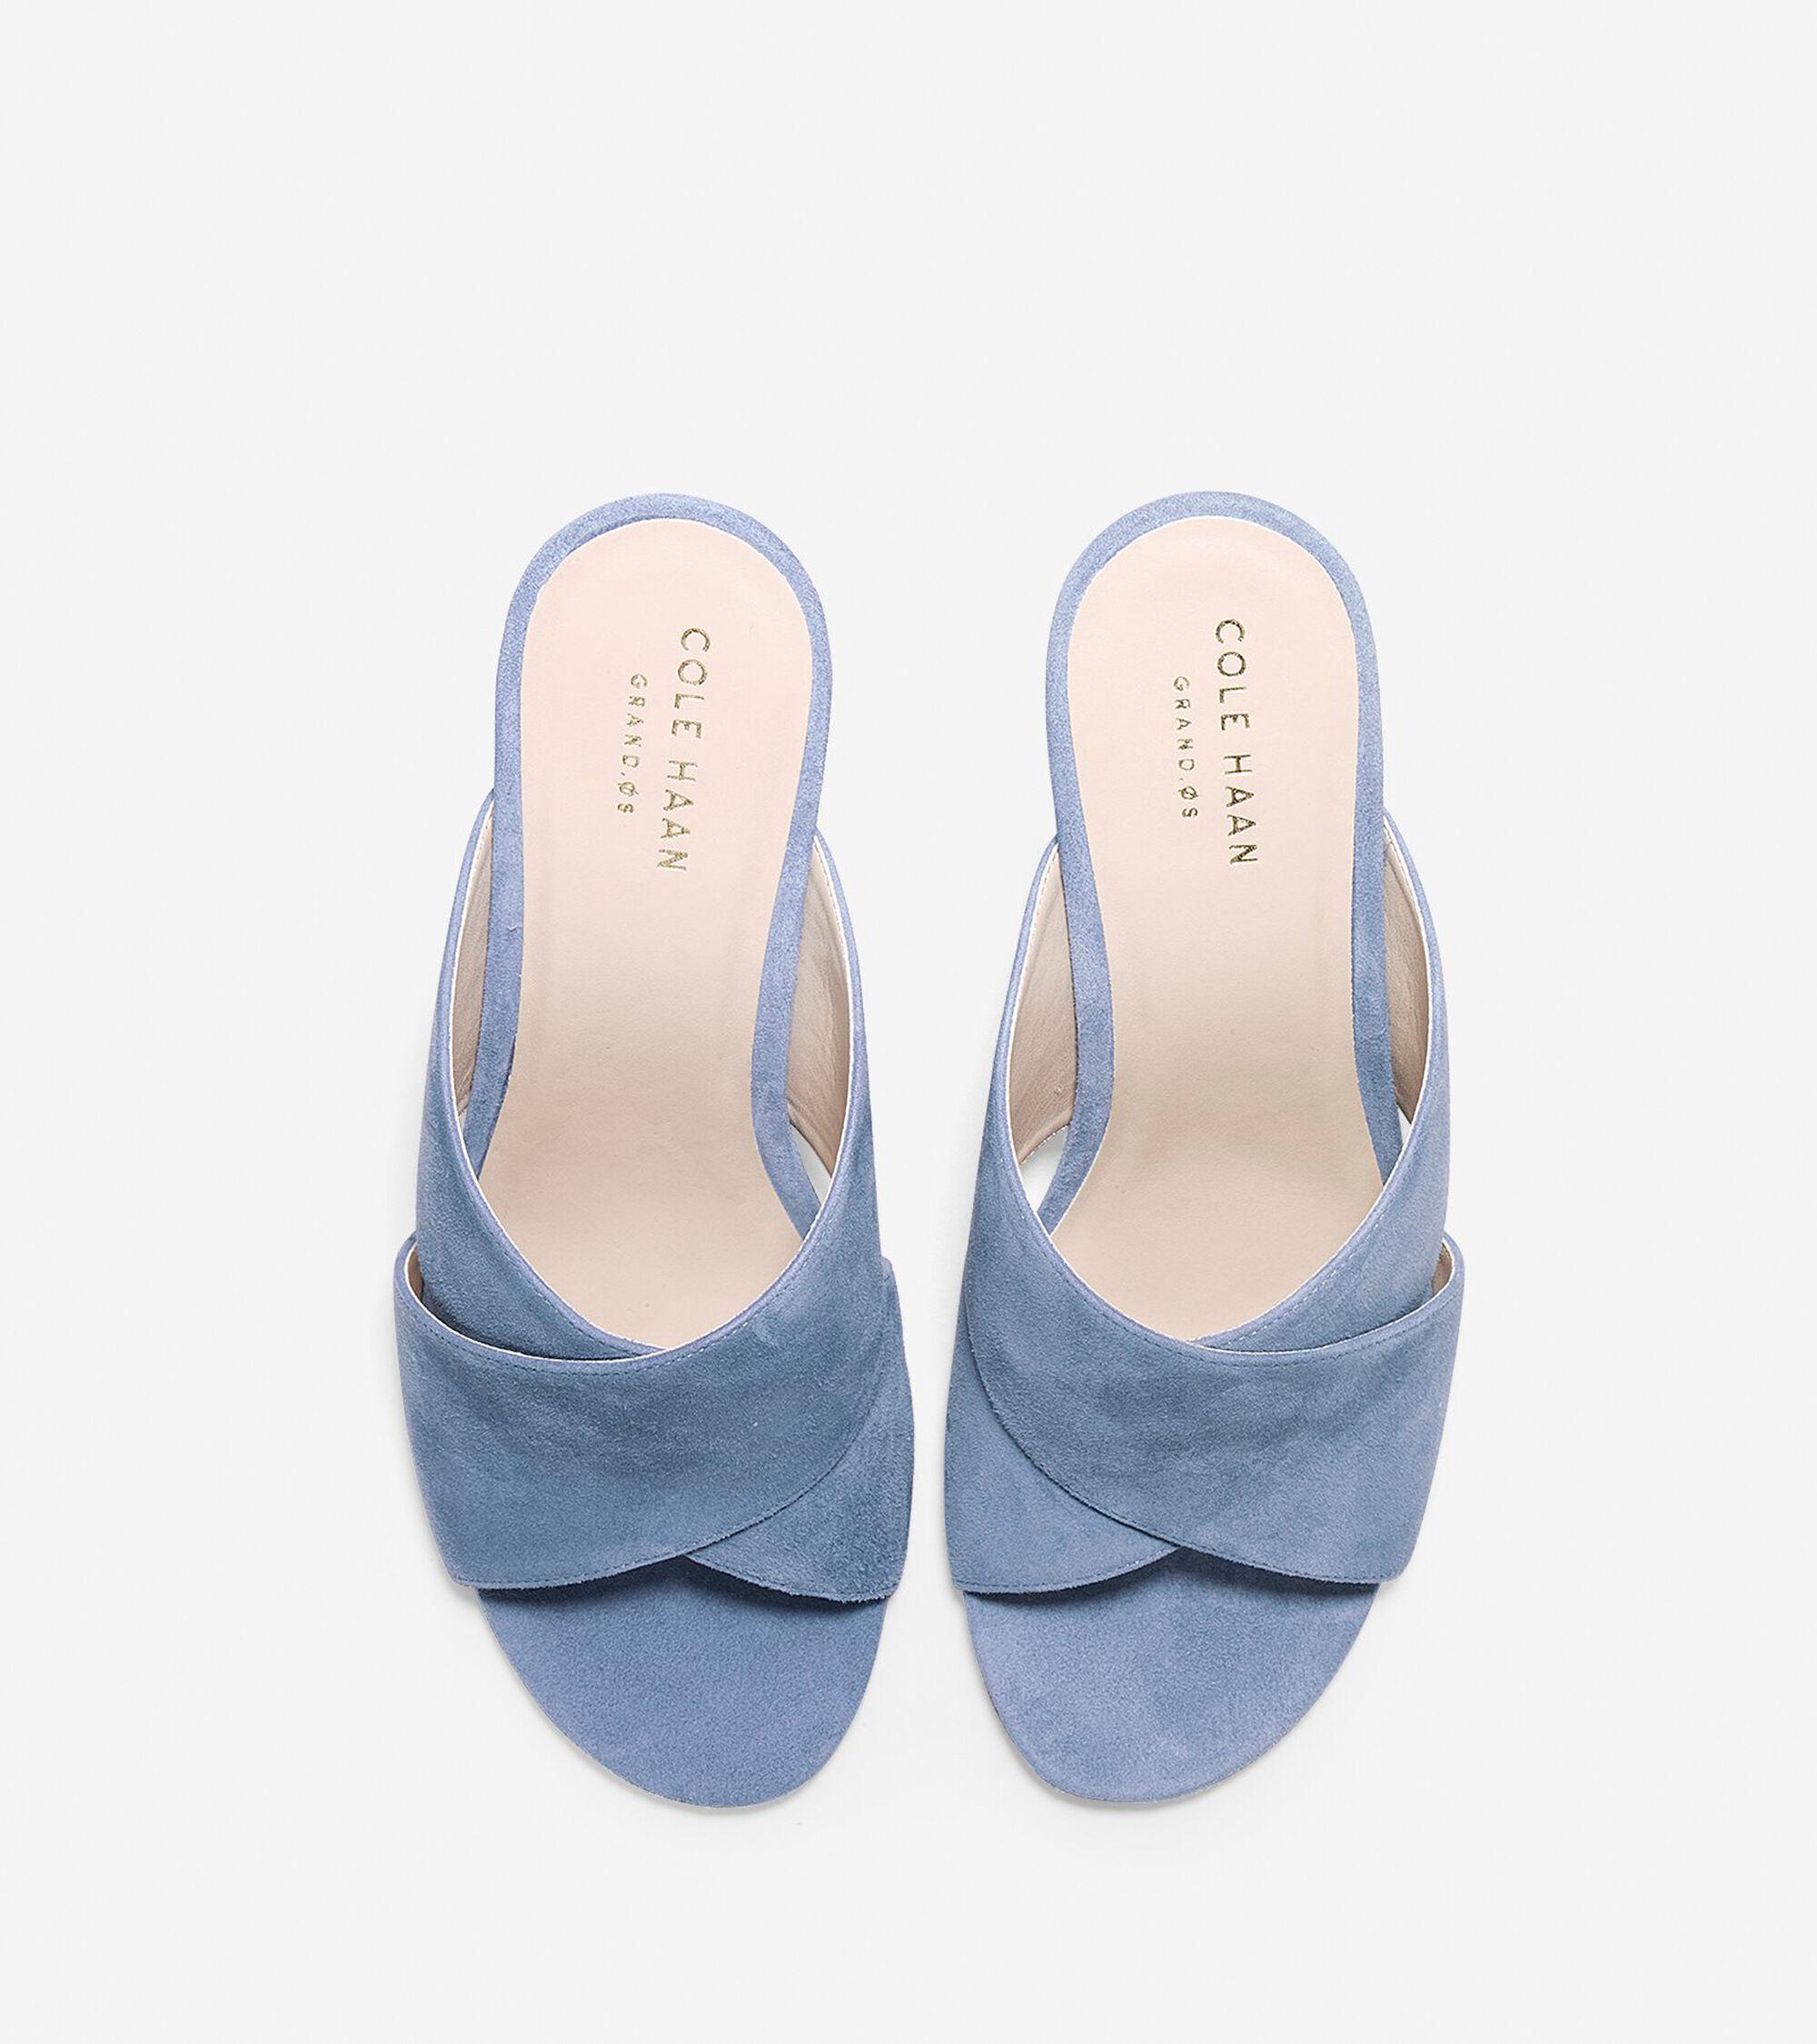 aab1efa4b892 Women s Gabby Sandals 85mm in Cornwall Blue Suede